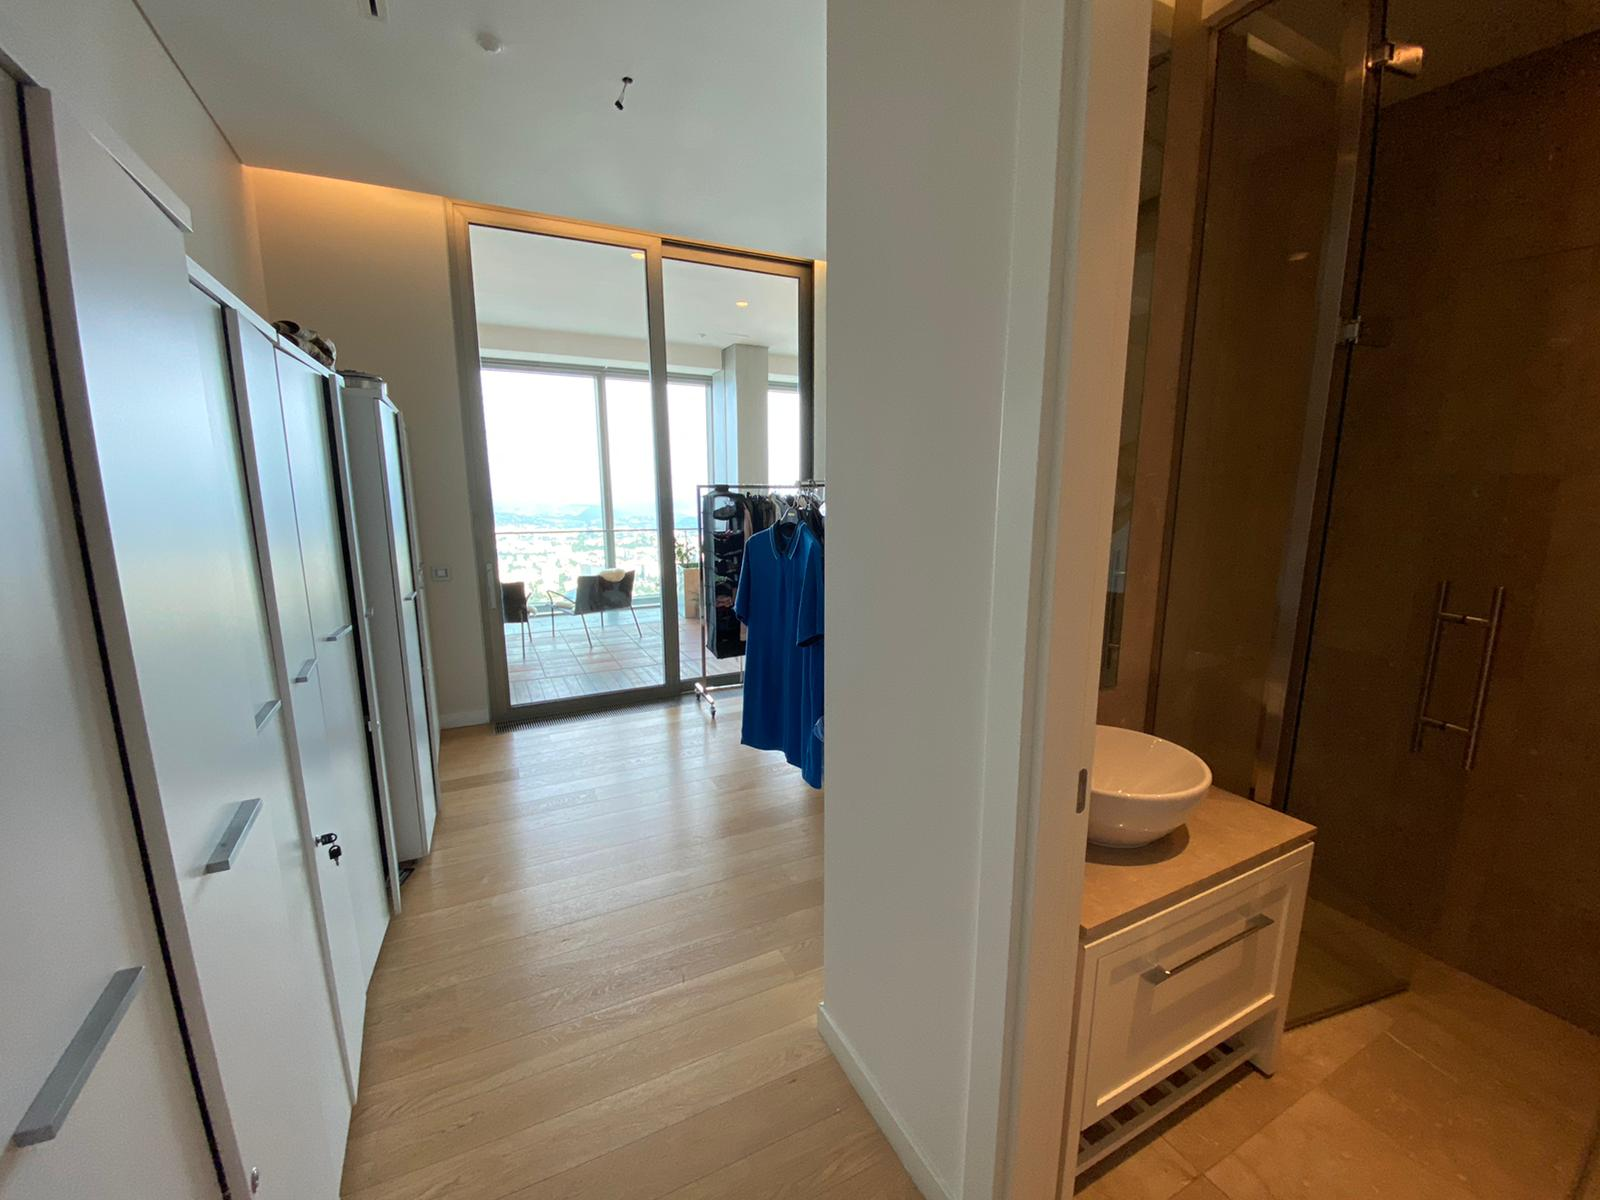 penthouse-istanbul-sapphire-tower-42th-floor-014.jpg